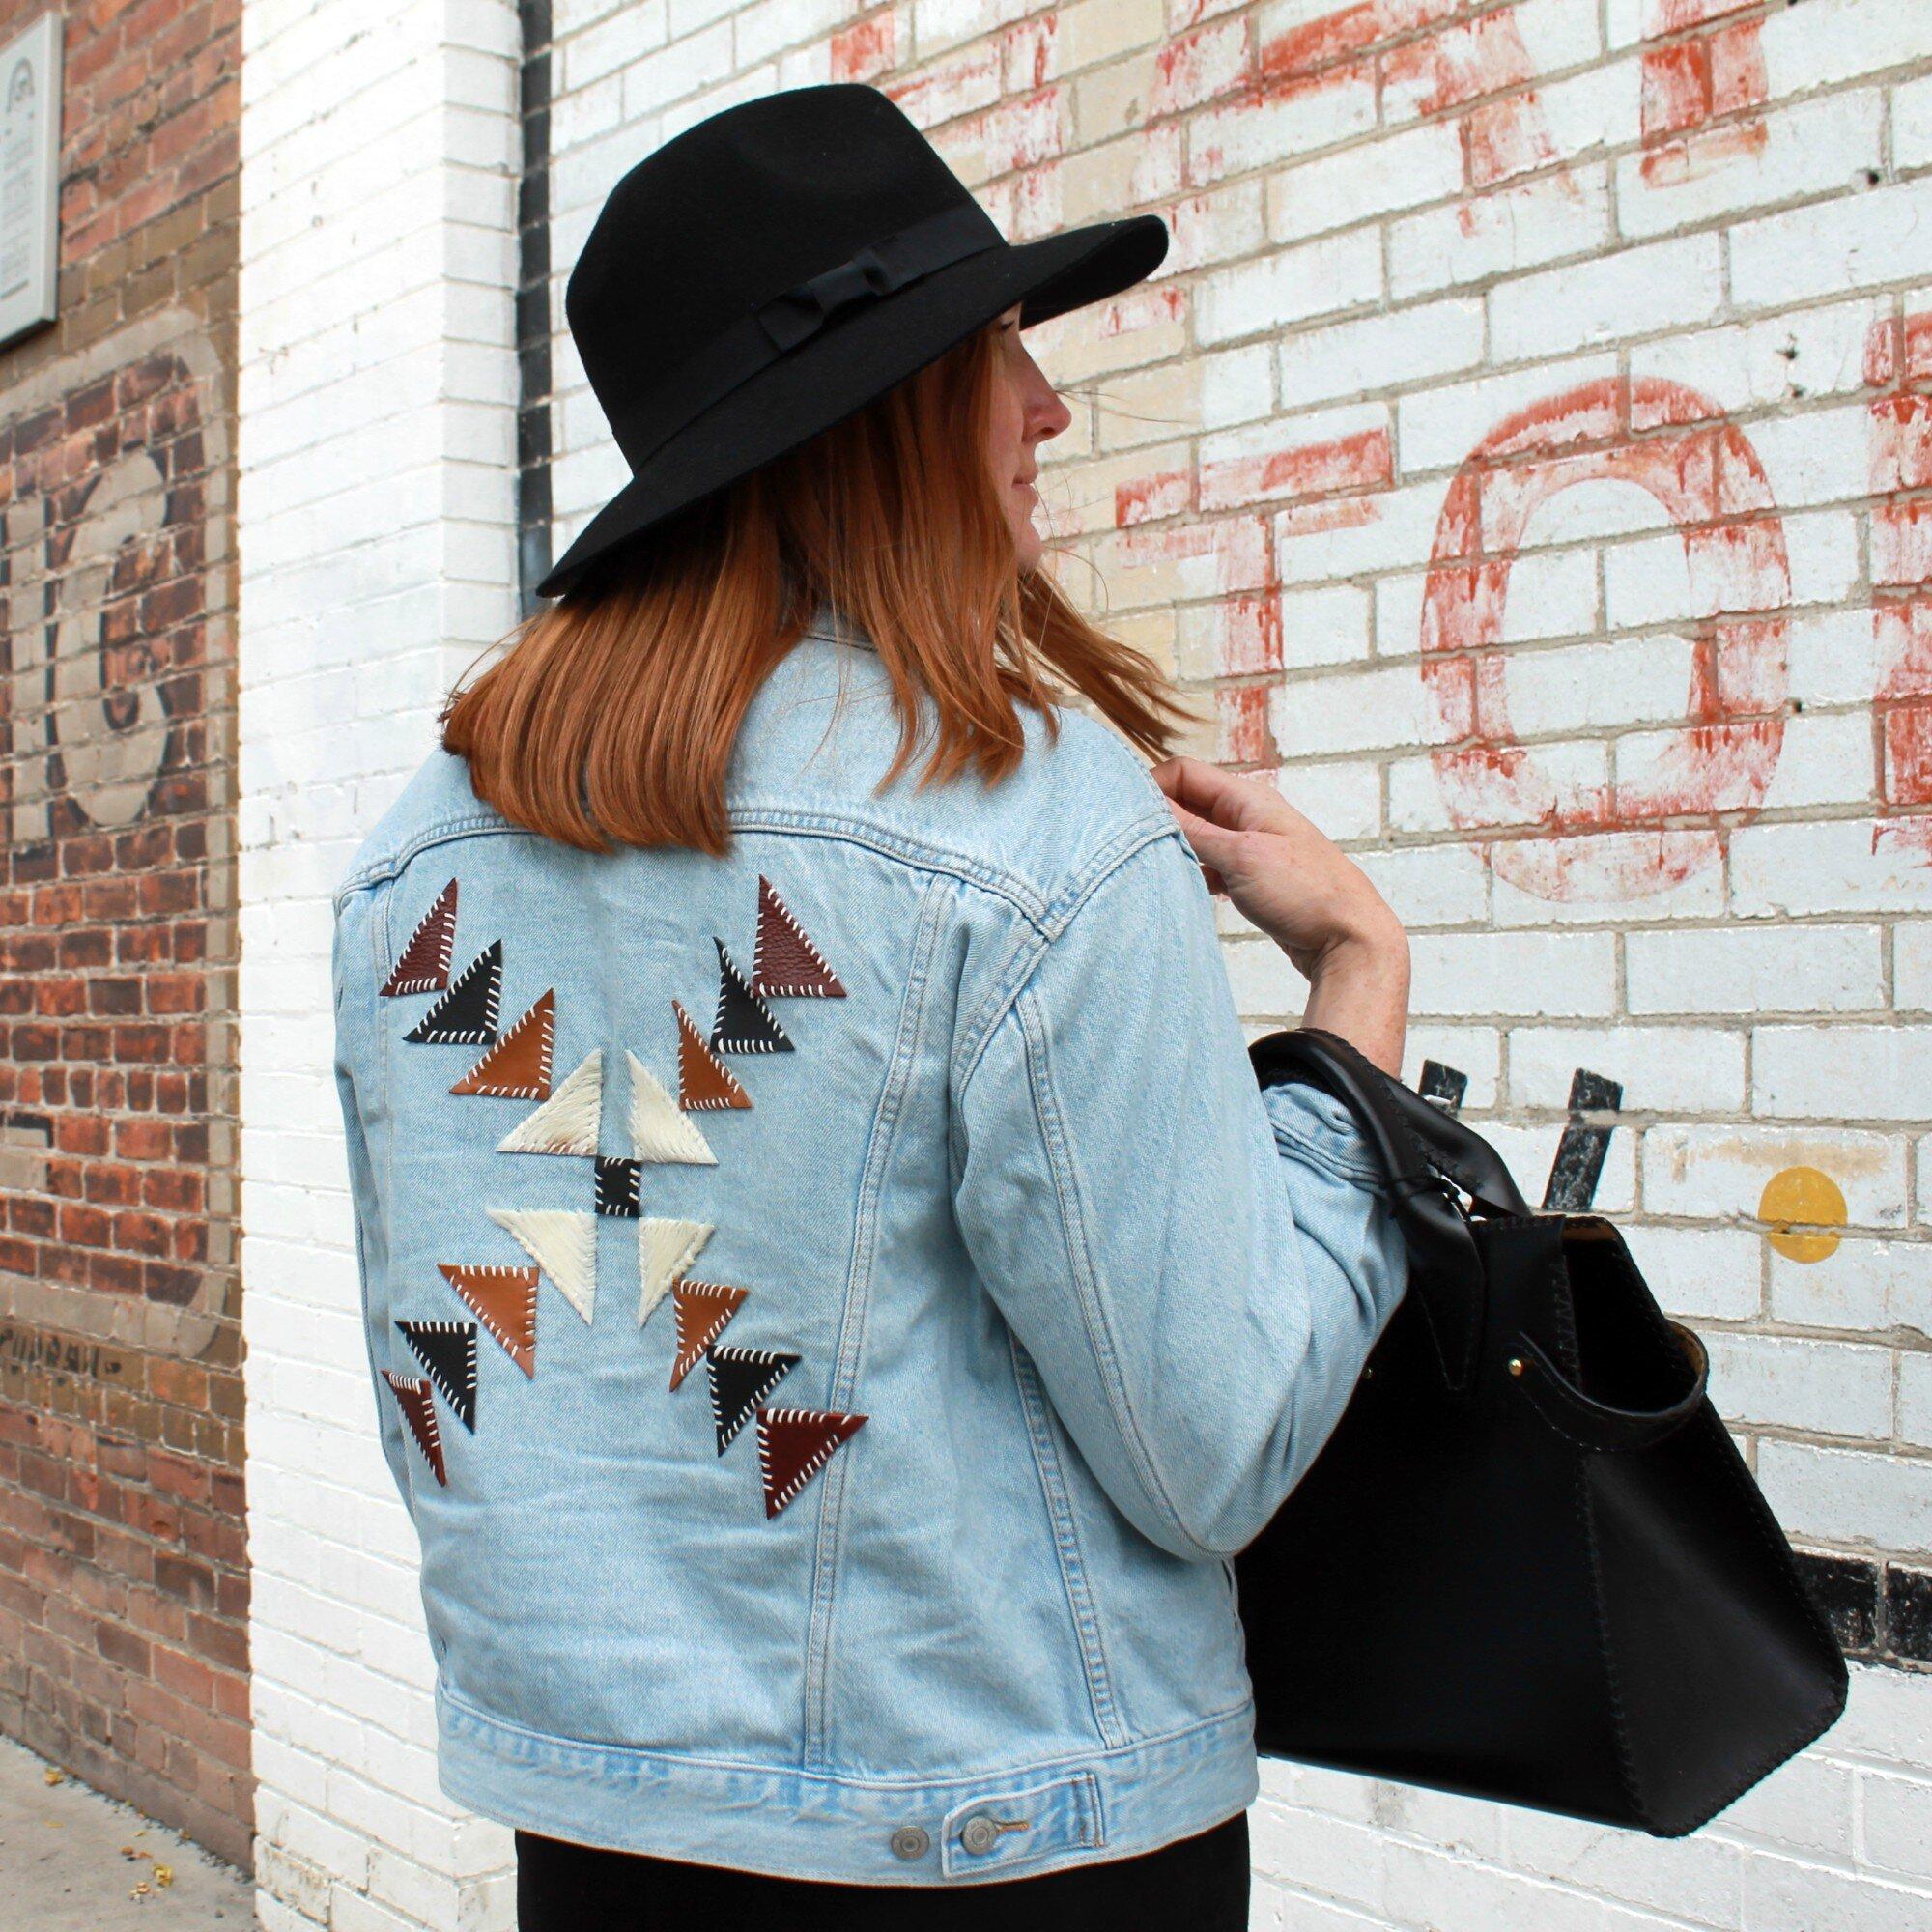 Customized Jean Jacket Design